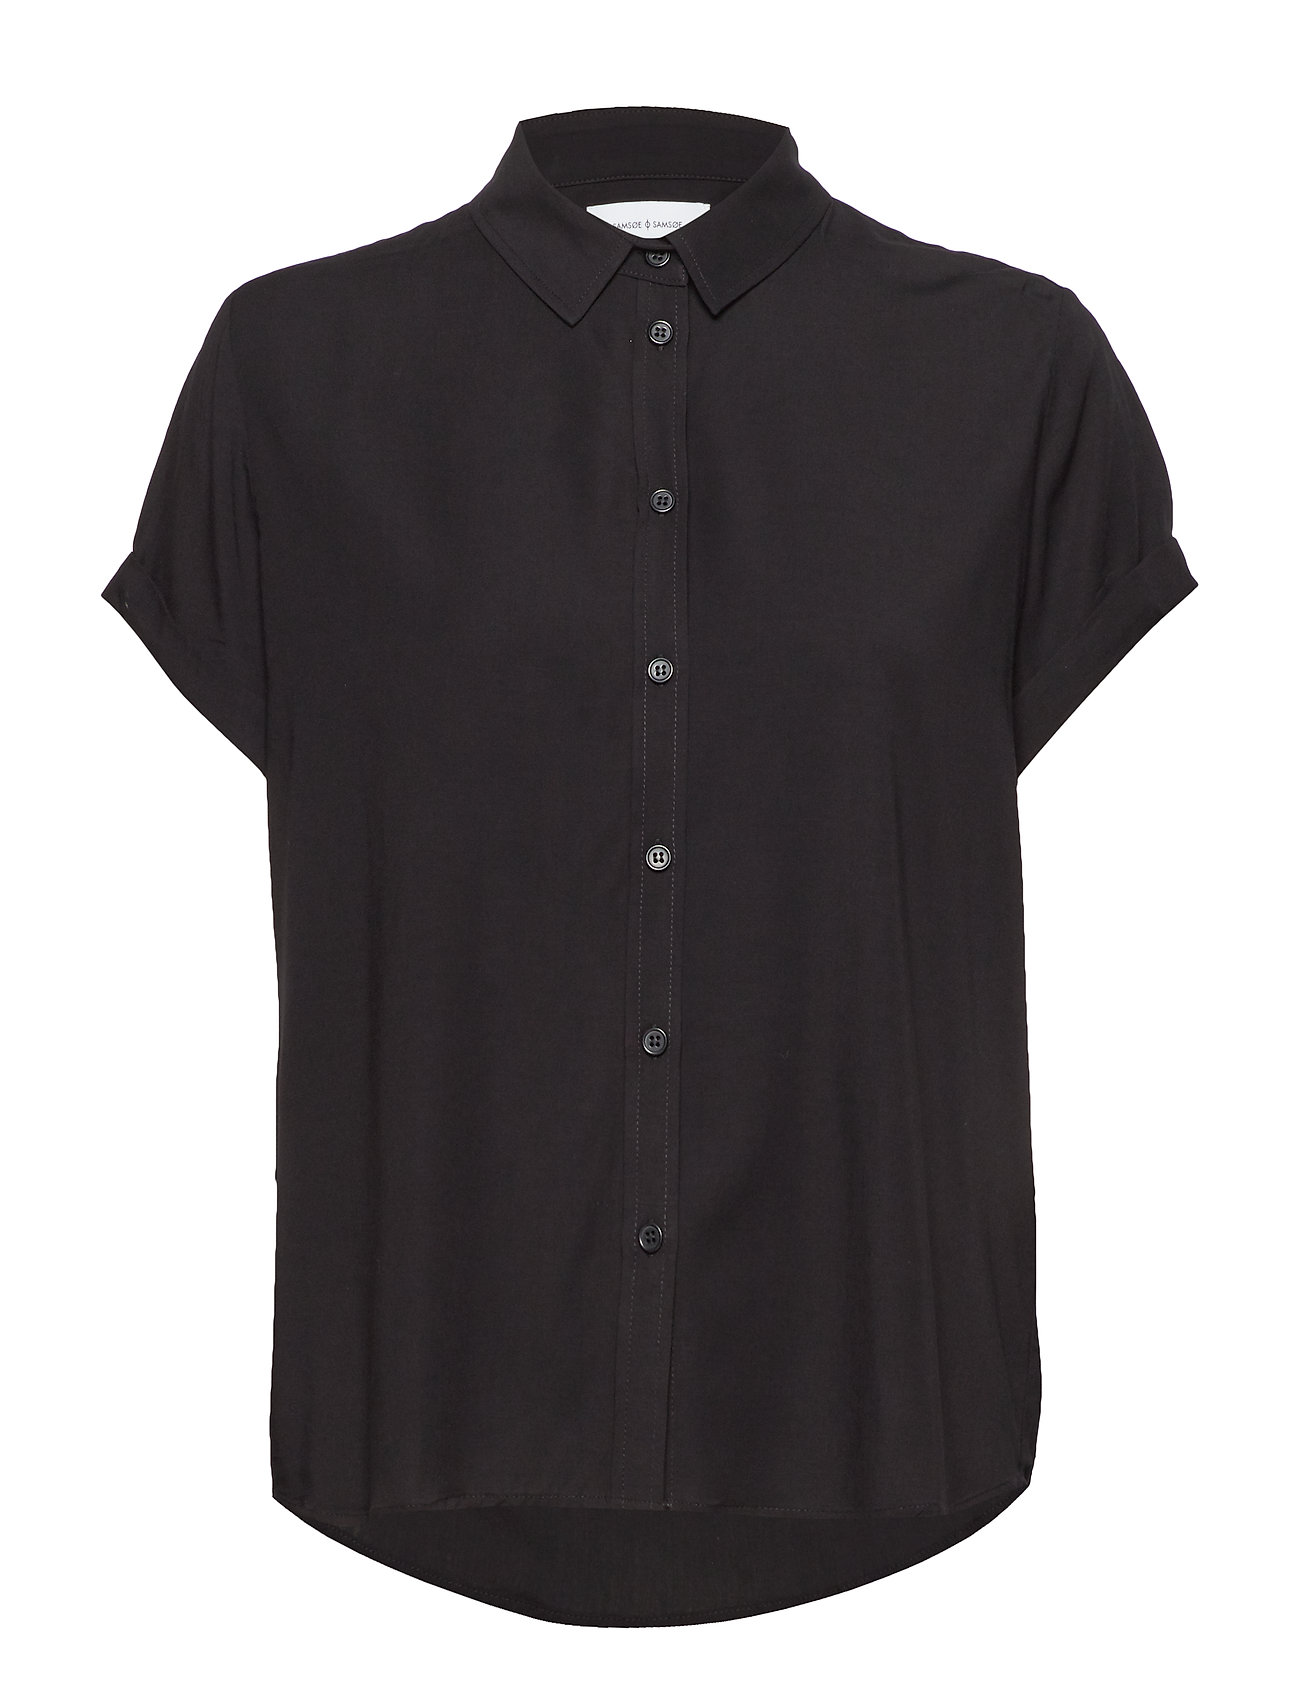 Samsøe Samsøe Majan ss shirt 9942 - BLACK